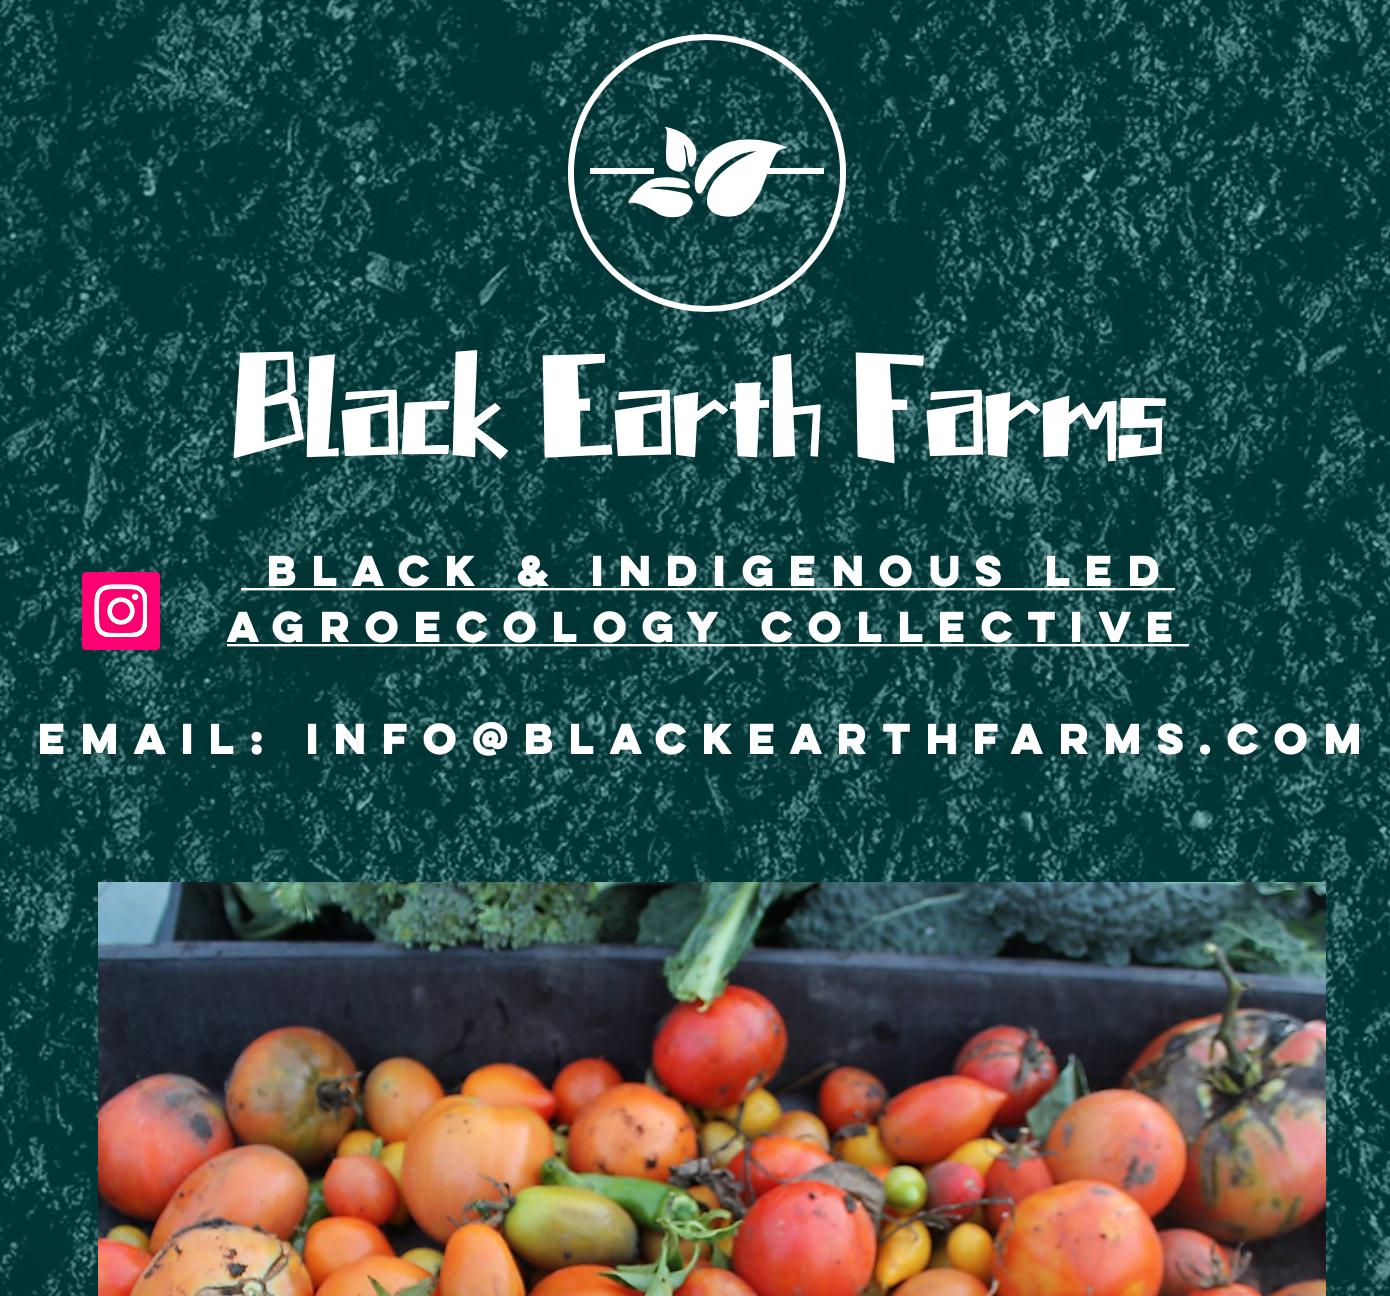 Black Earth Farms